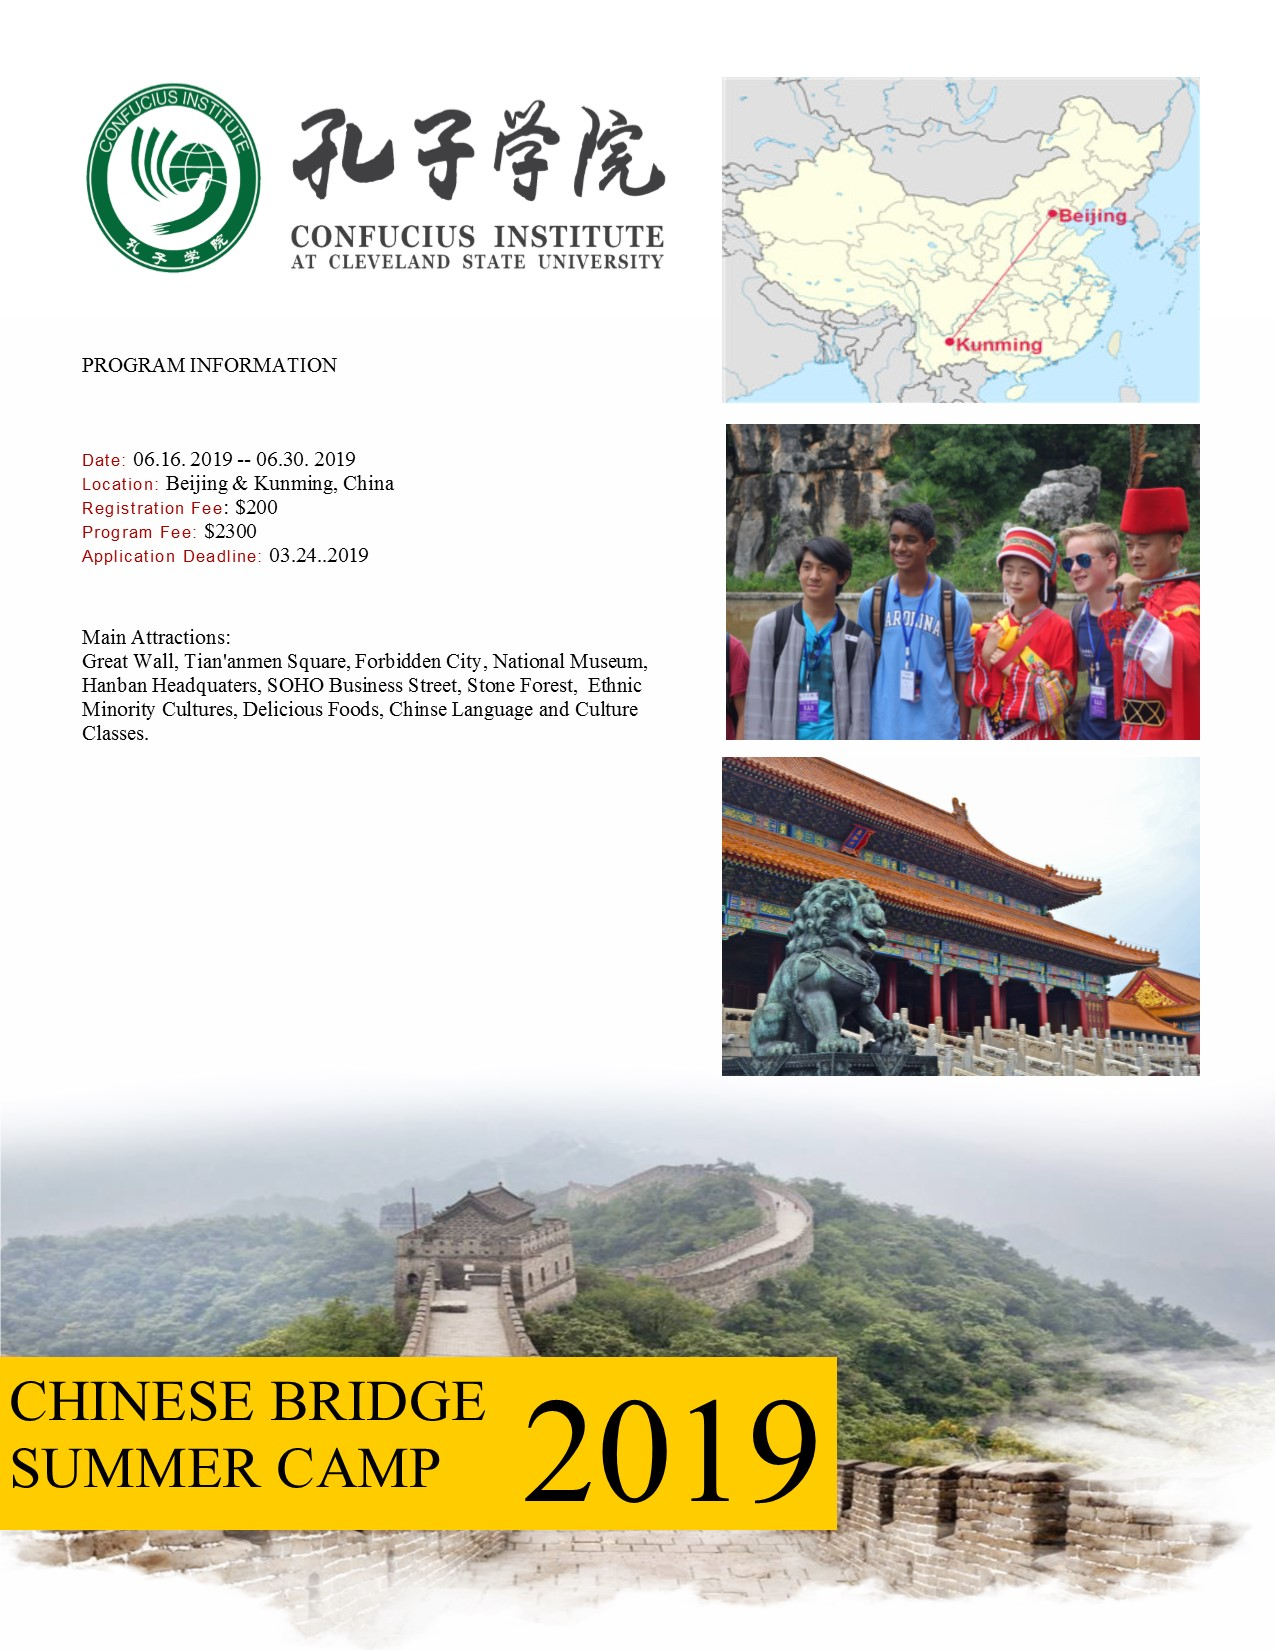 2019 SUMMER CAMP flyer 1